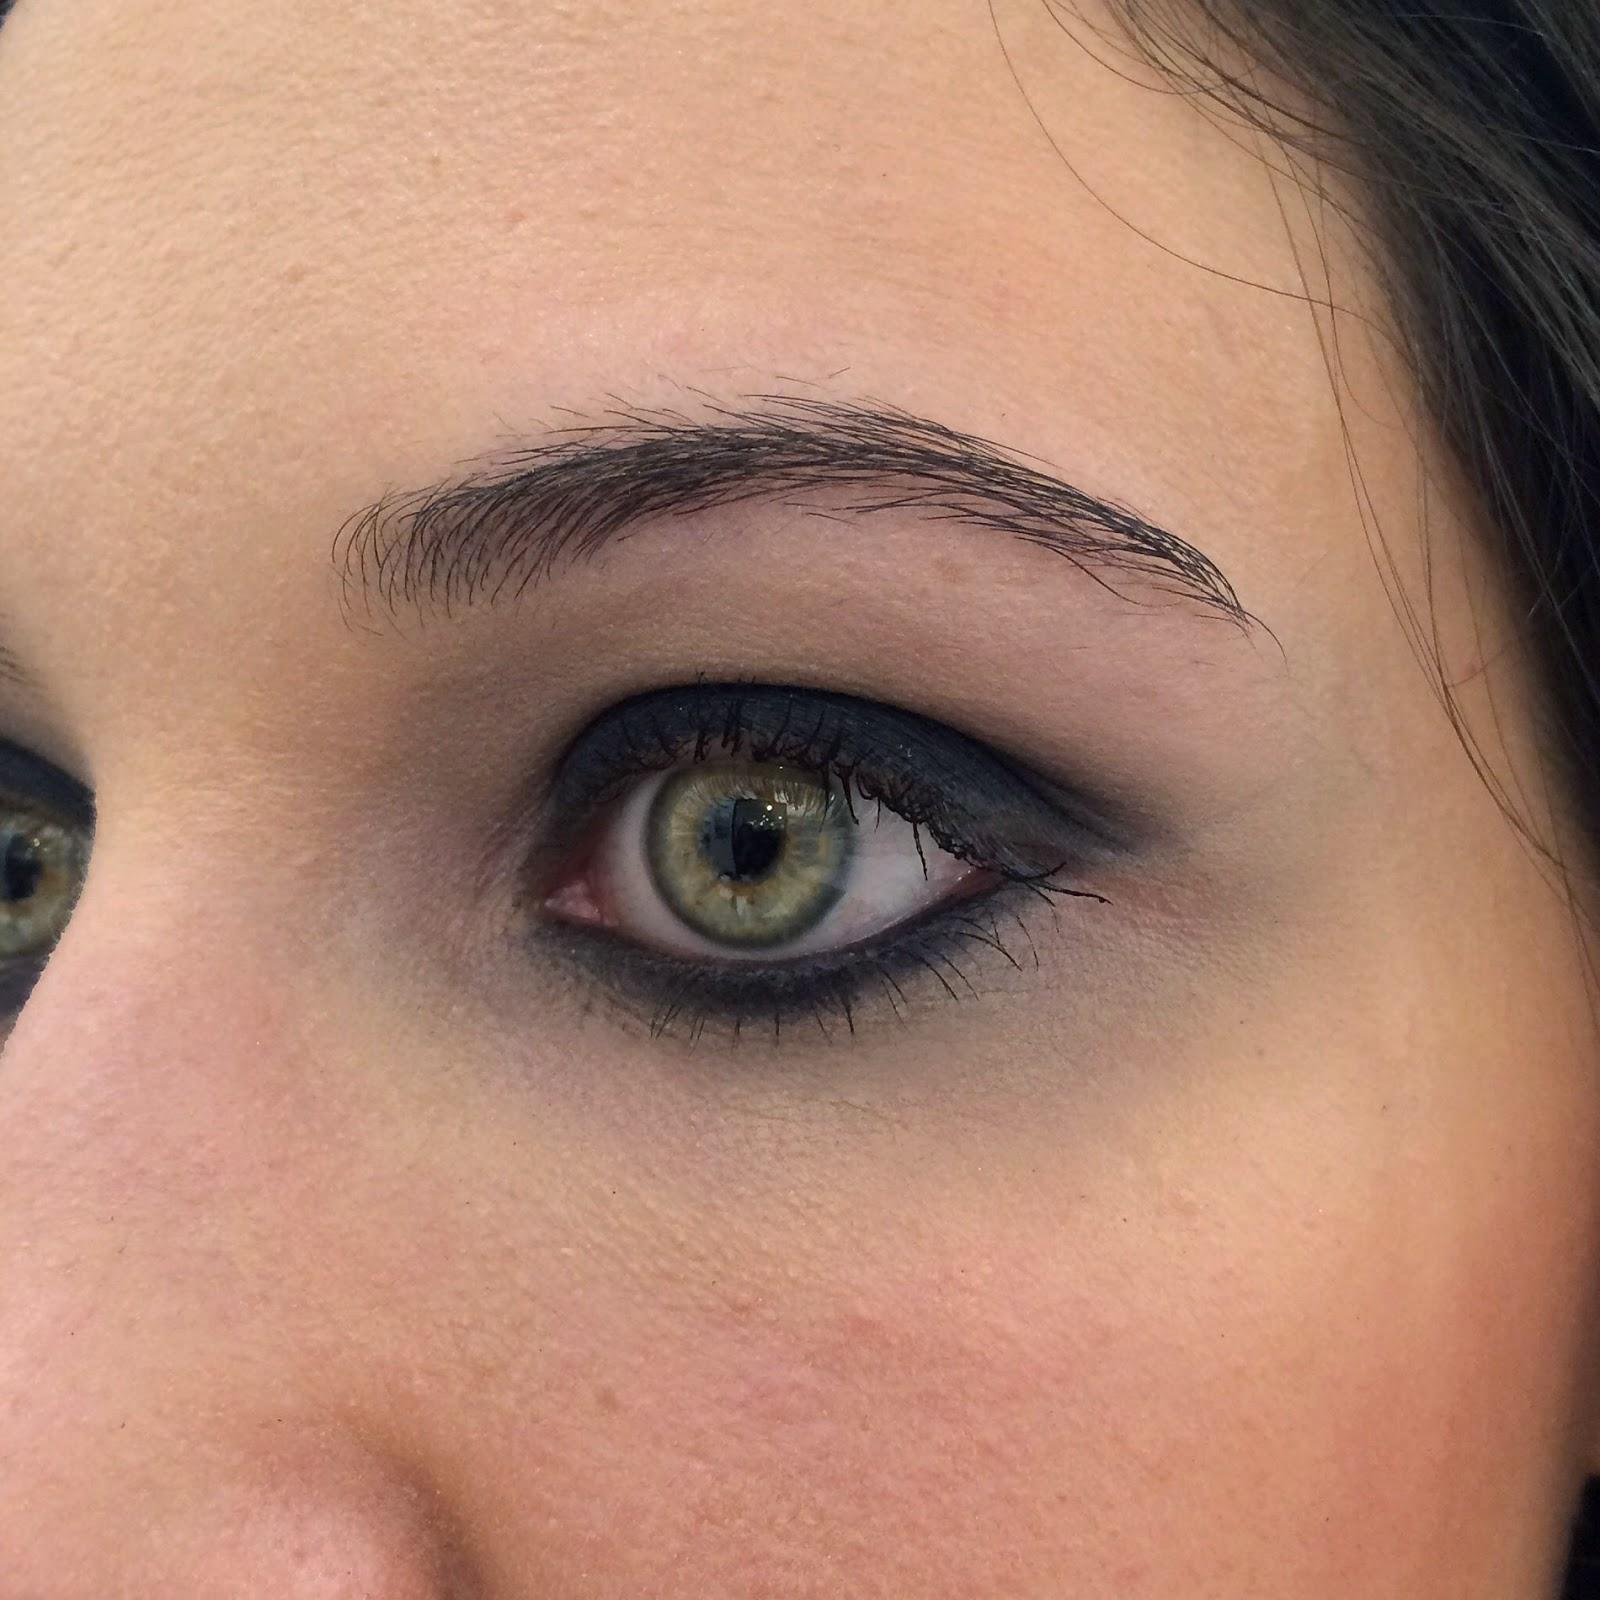 lezioni gratuite di makeup smashbox